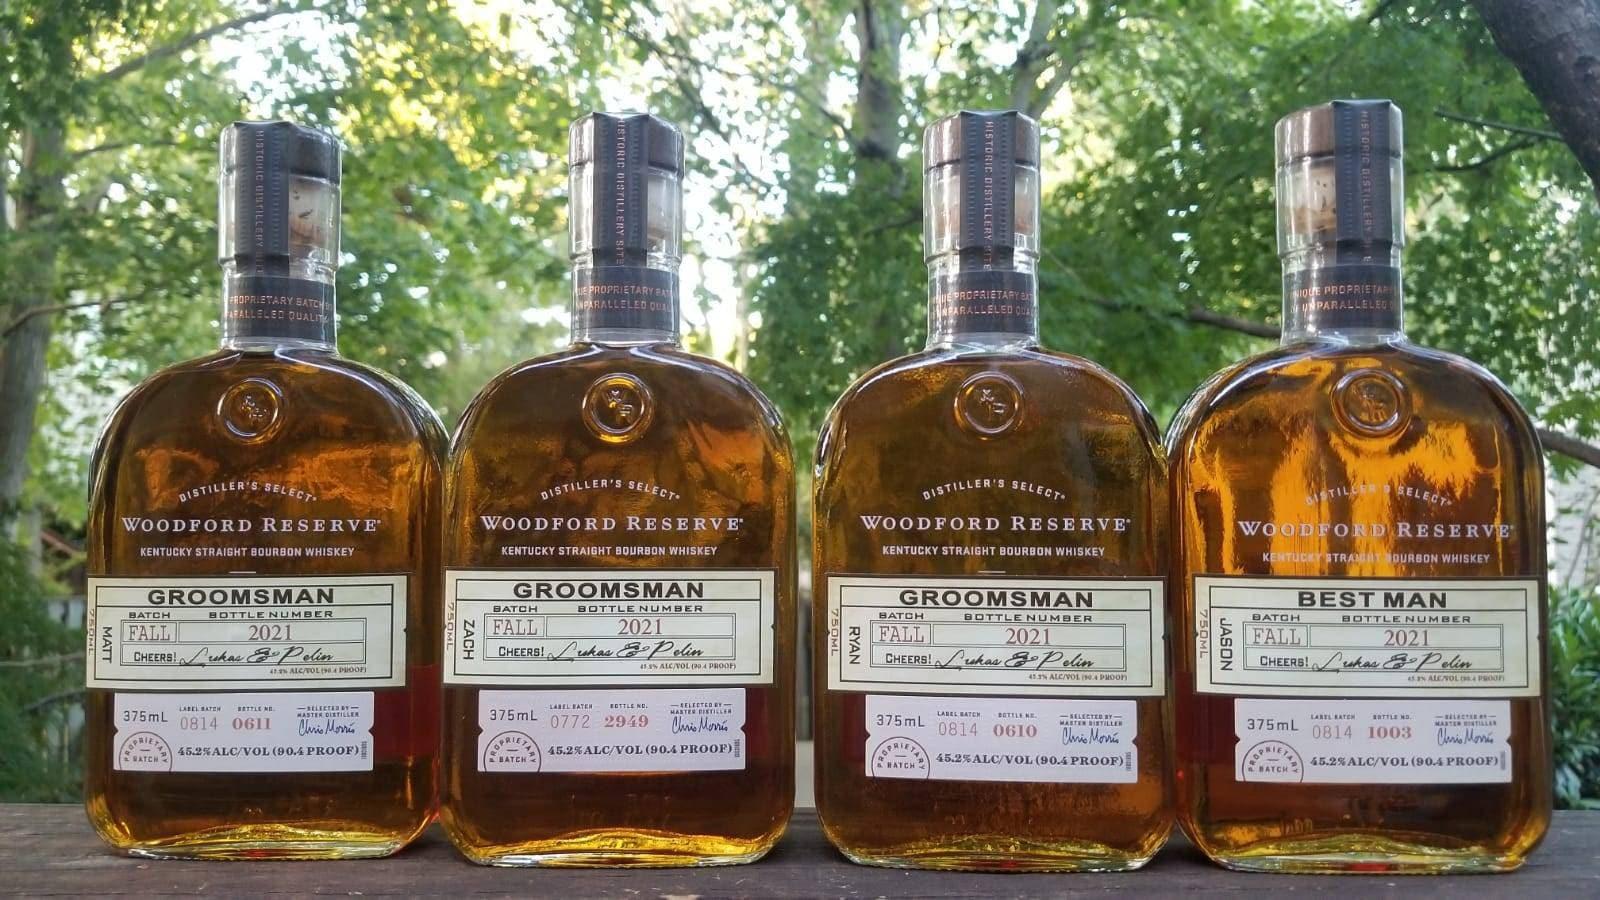 pelin Belendir added a photo of their purchase